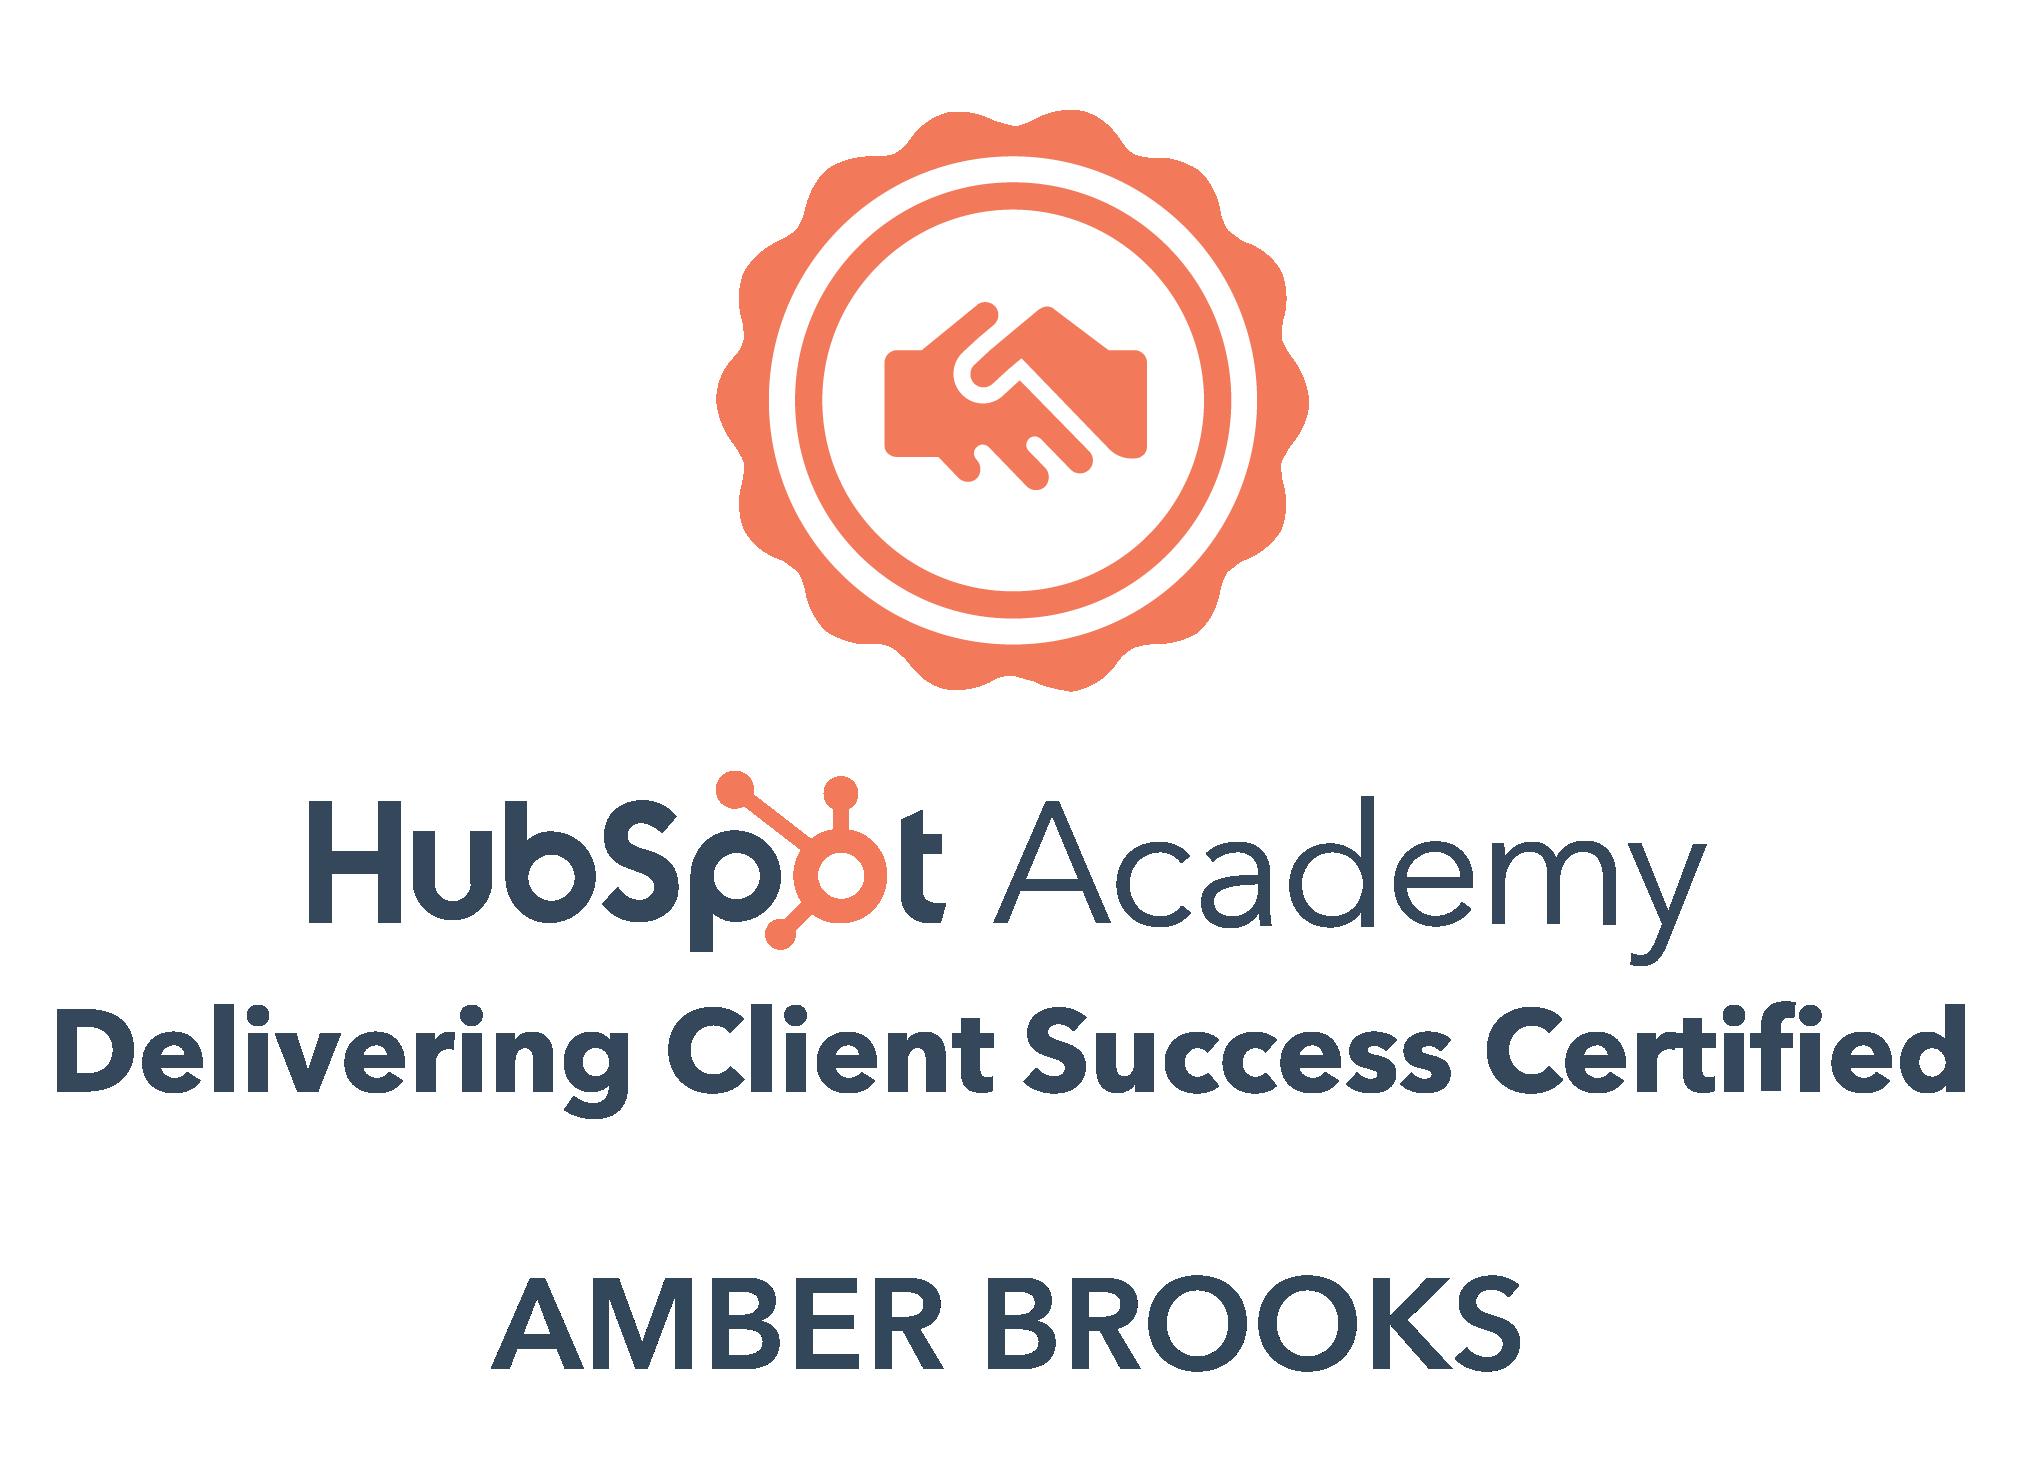 HubSpot Delivering Client Success certification